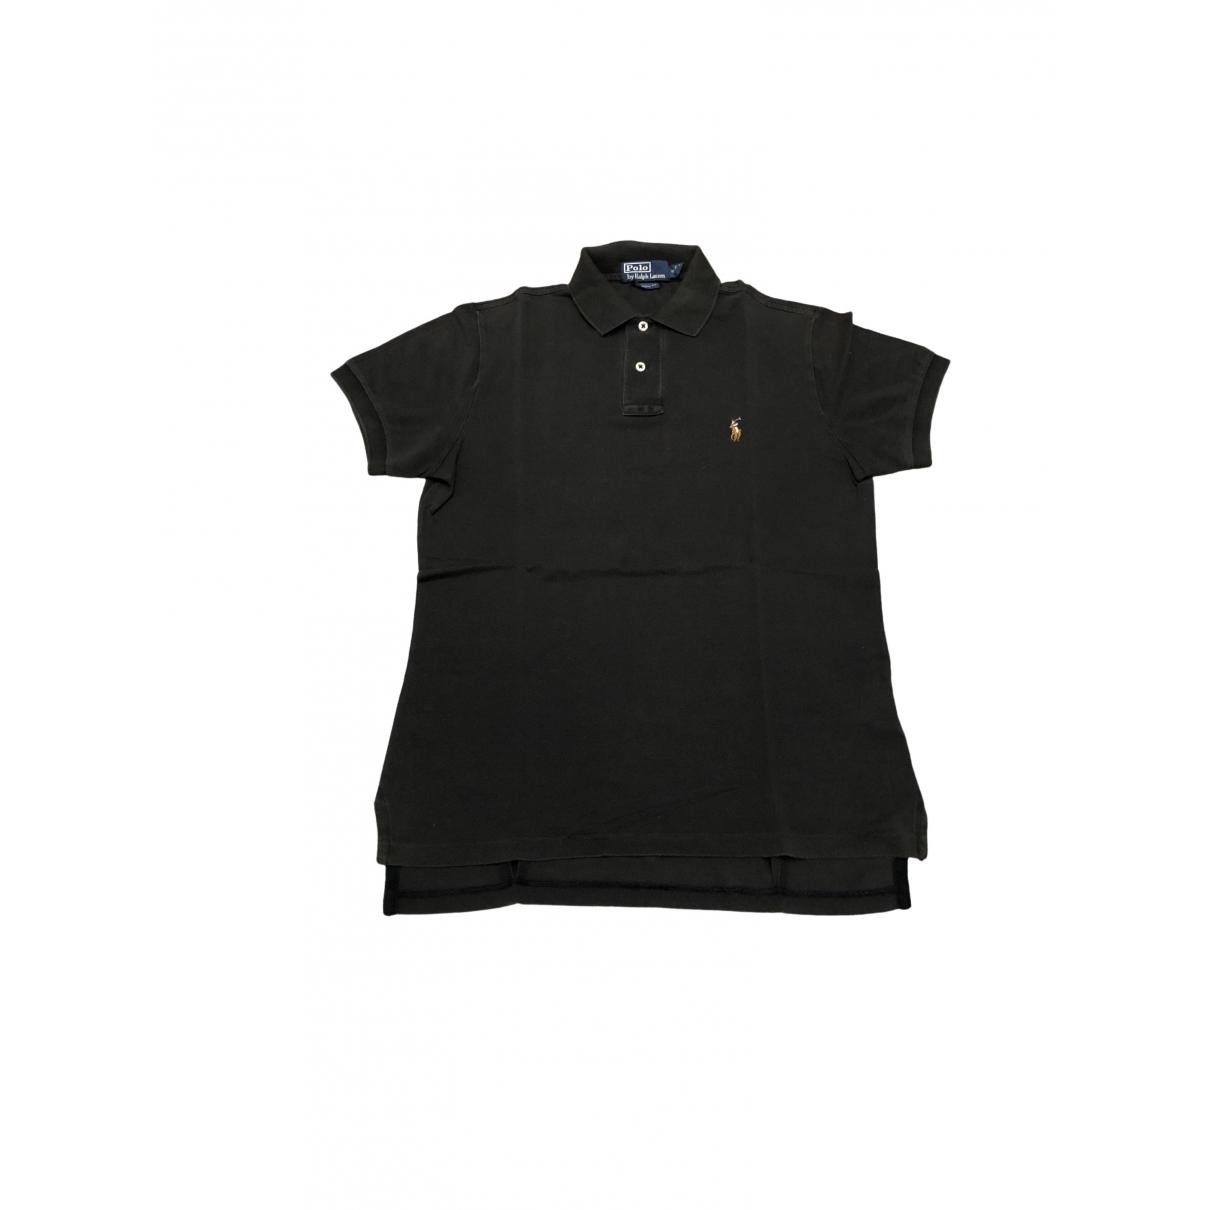 Polo Ralph Lauren - Polos Polo ajuste manches courtes pour homme en coton - noir